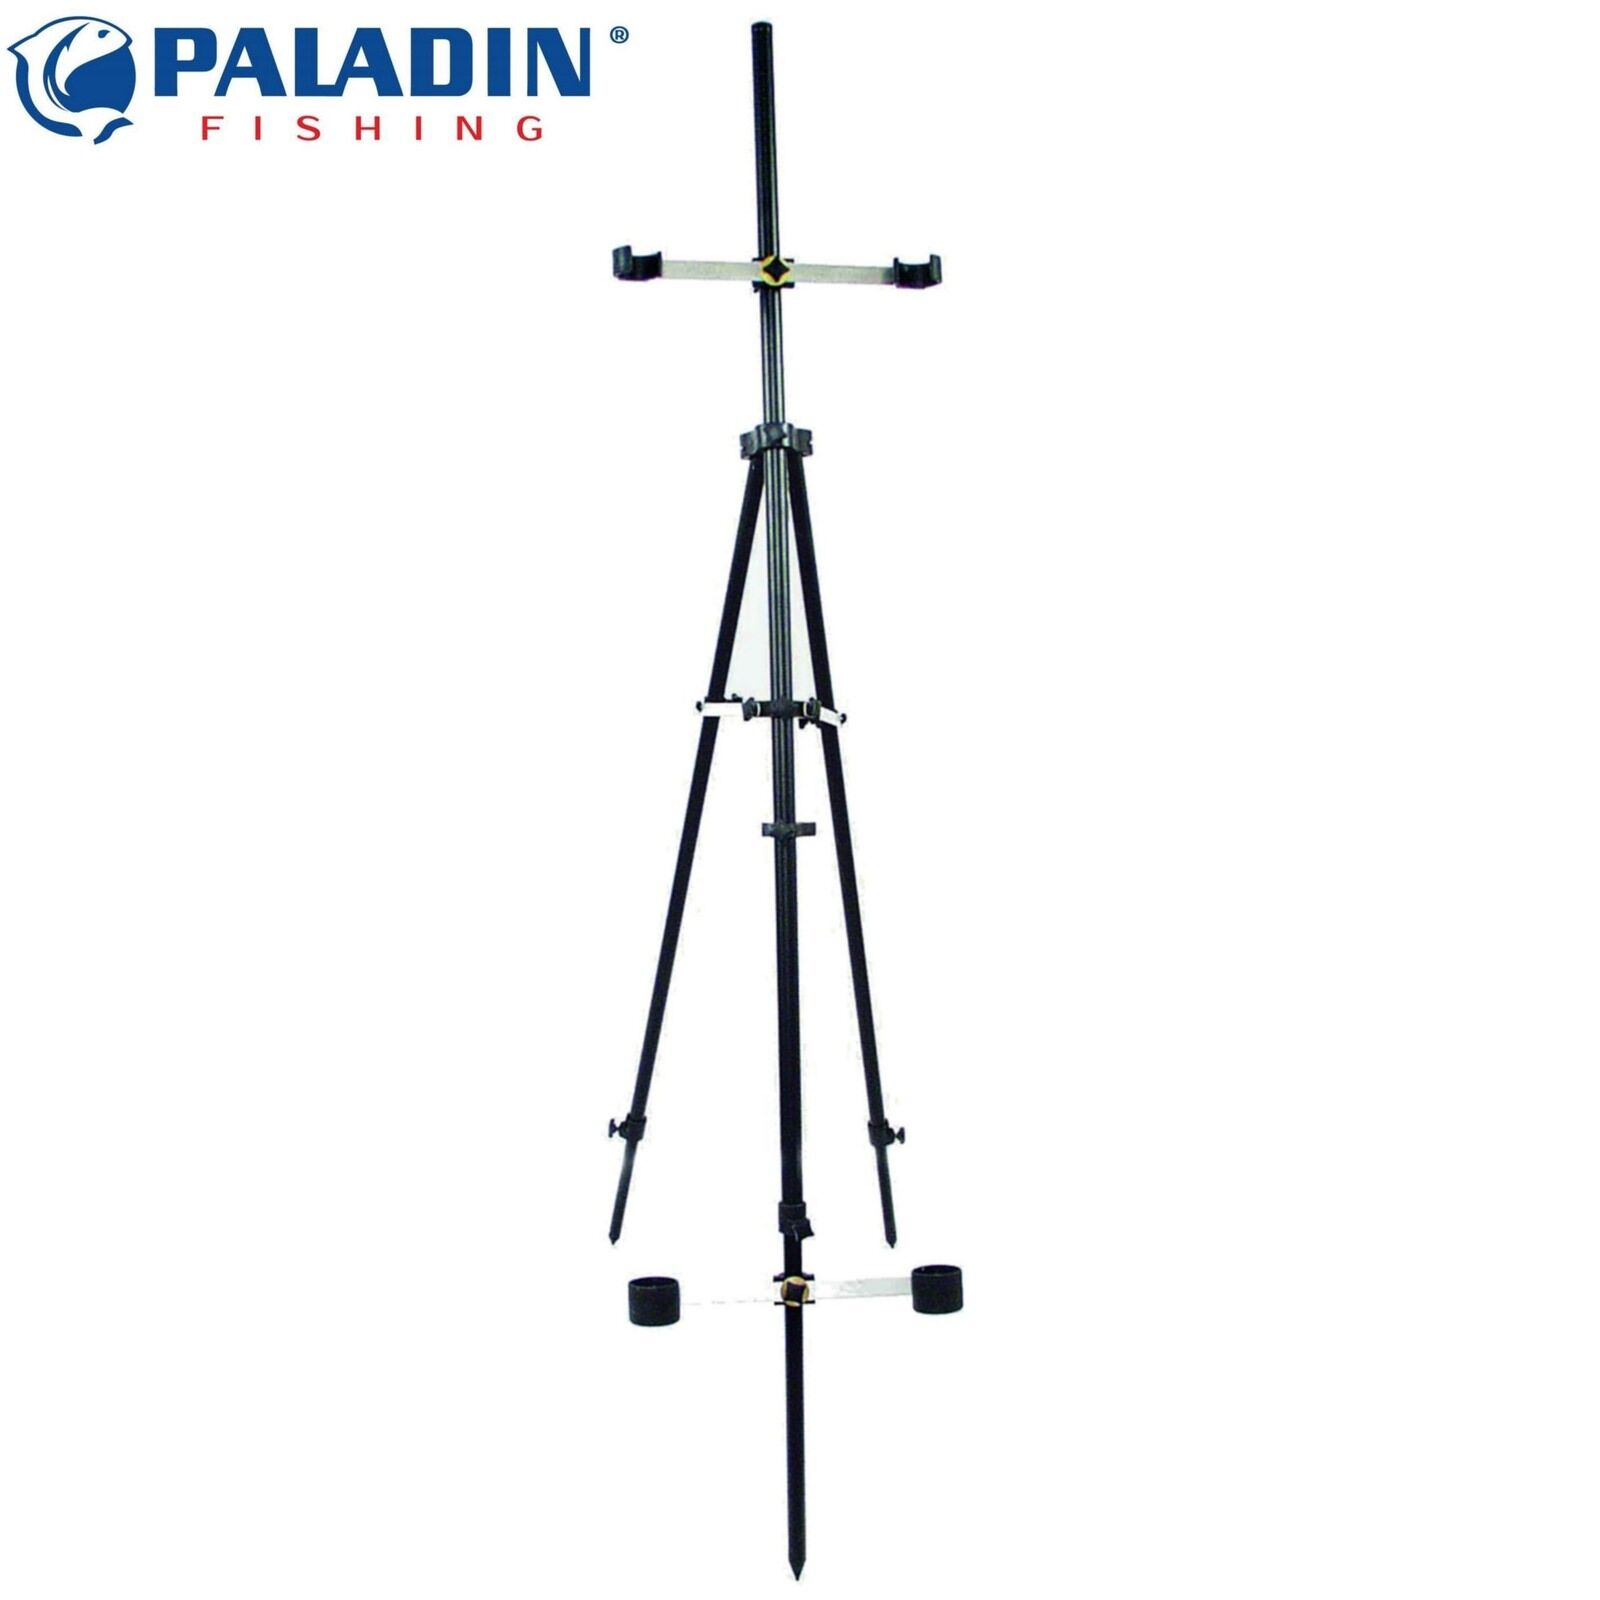 Paladin Brandungsrutenhalter 100-180cm, 100-180cm, 100-180cm, Brandungsdreibein zum Brandungsangeln 707f06